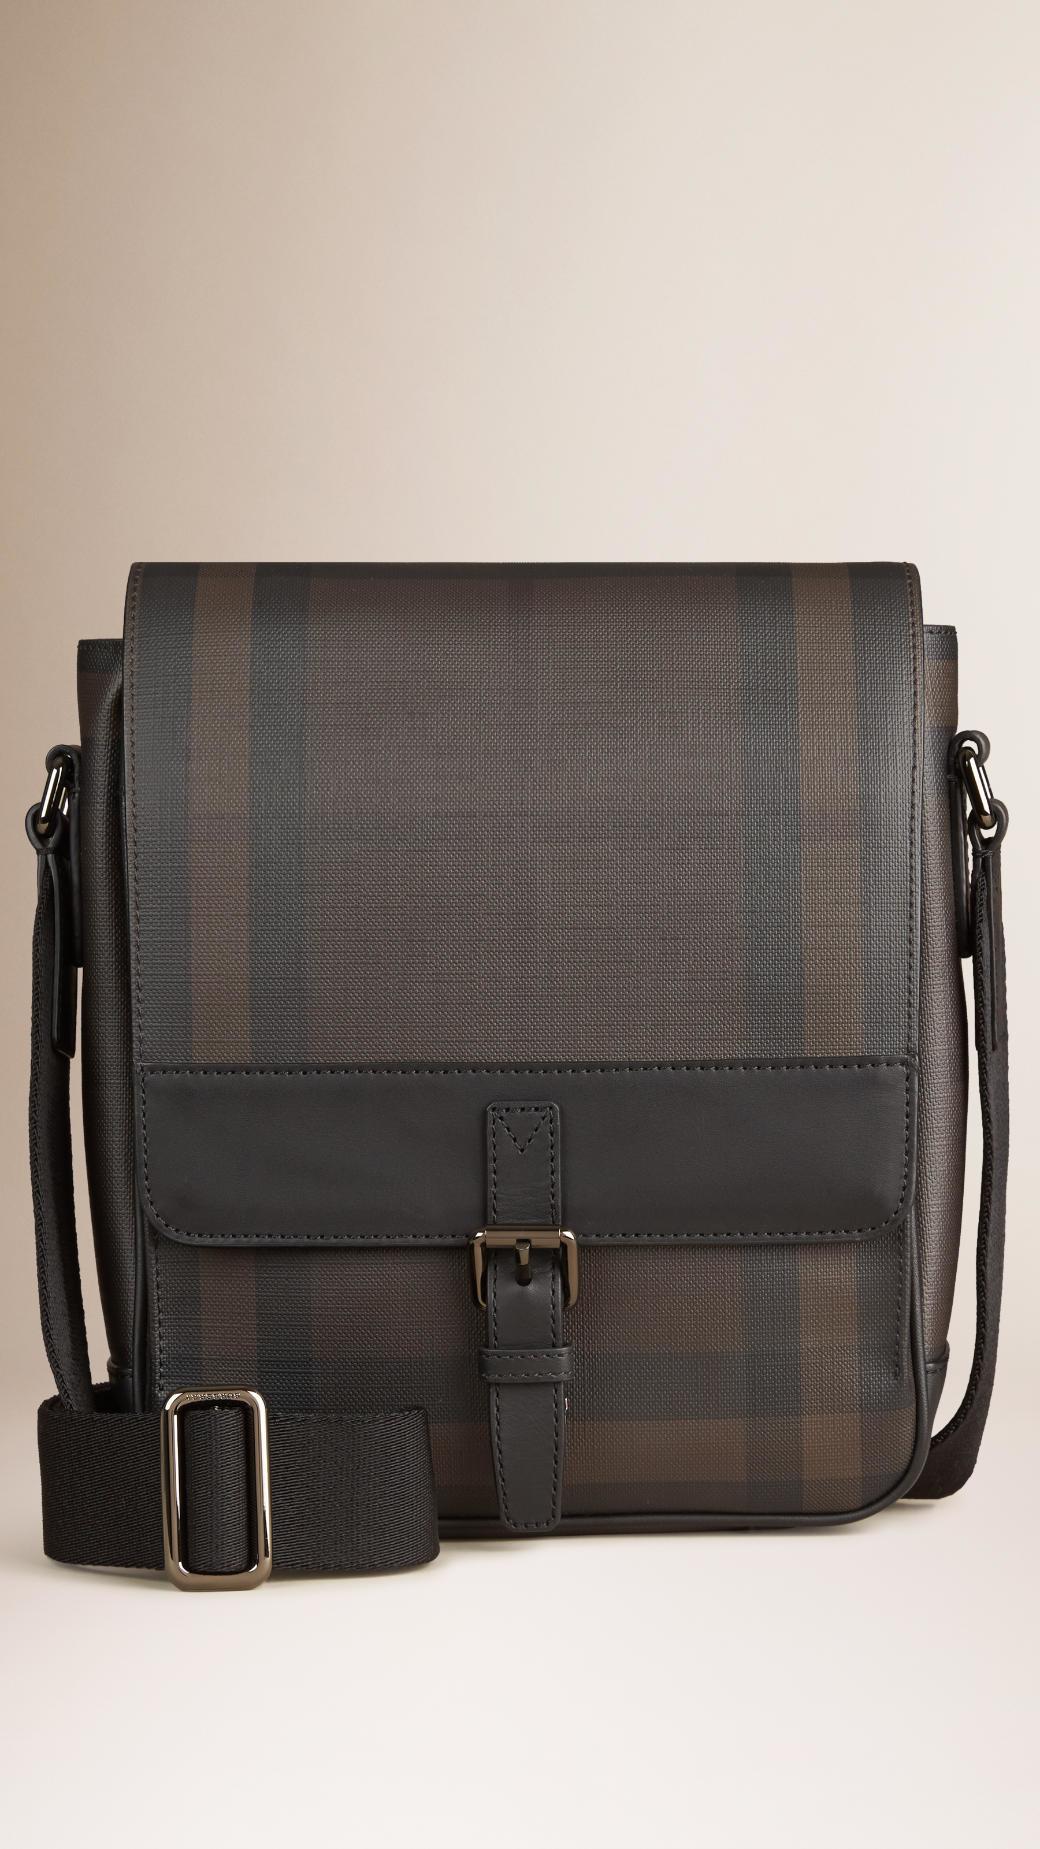 da545e58ee17 Lyst - Burberry Smoked Check Crossbody Bag in Black for Men